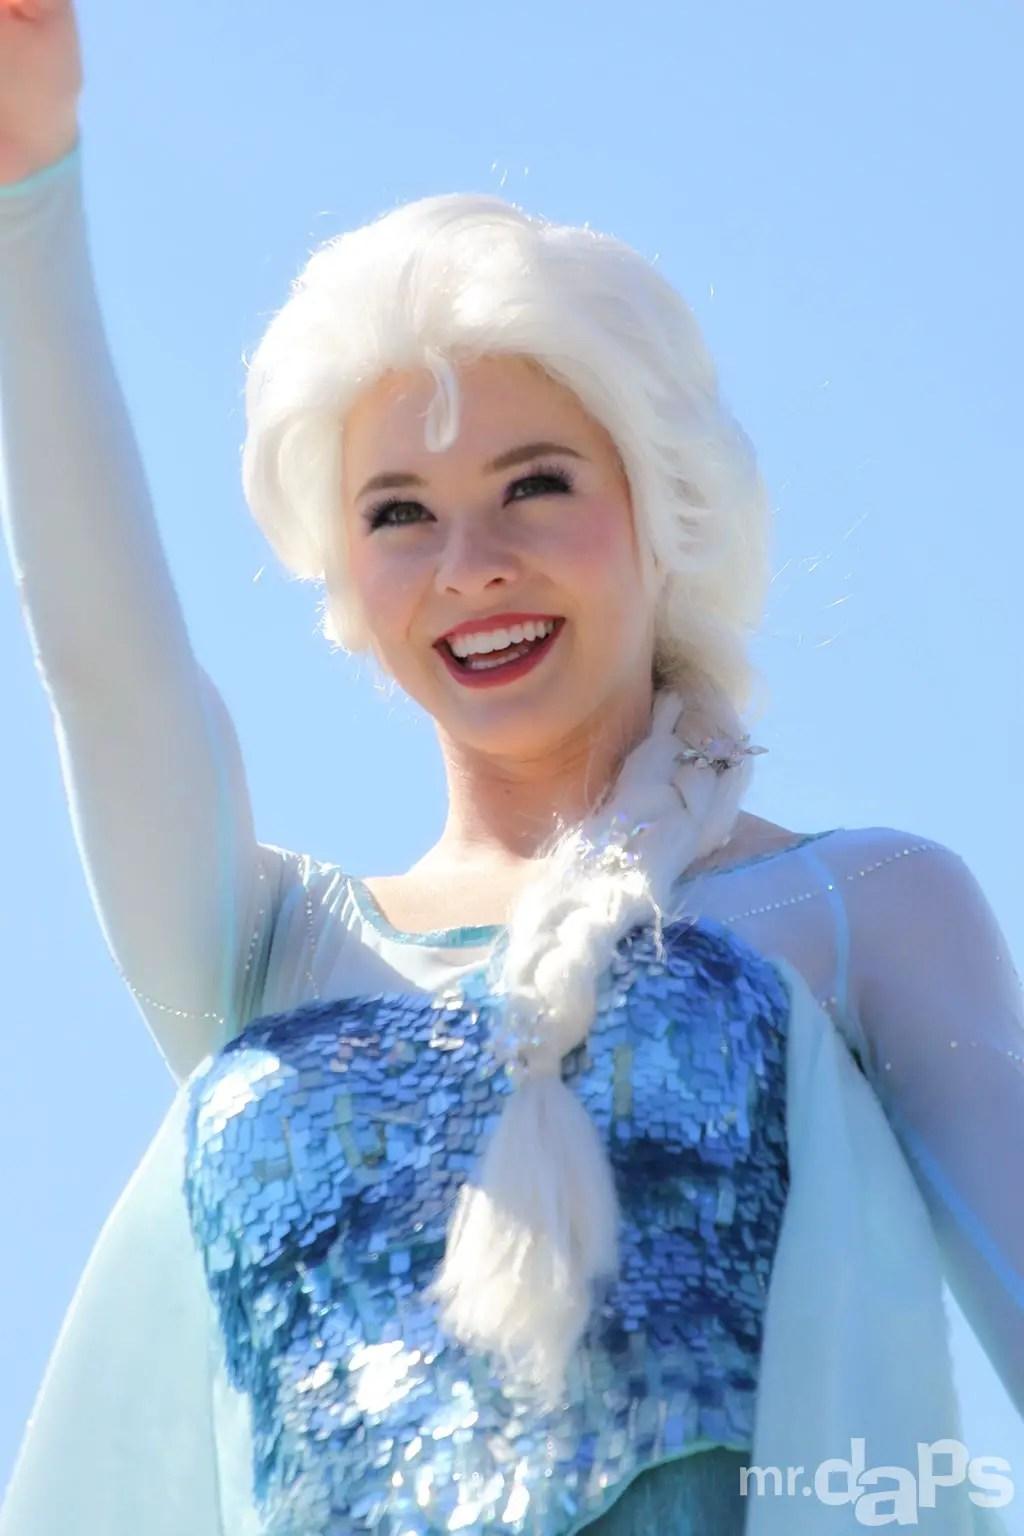 Elsa - Frozen Pre-Parade at Disneyland - August 17, 2014